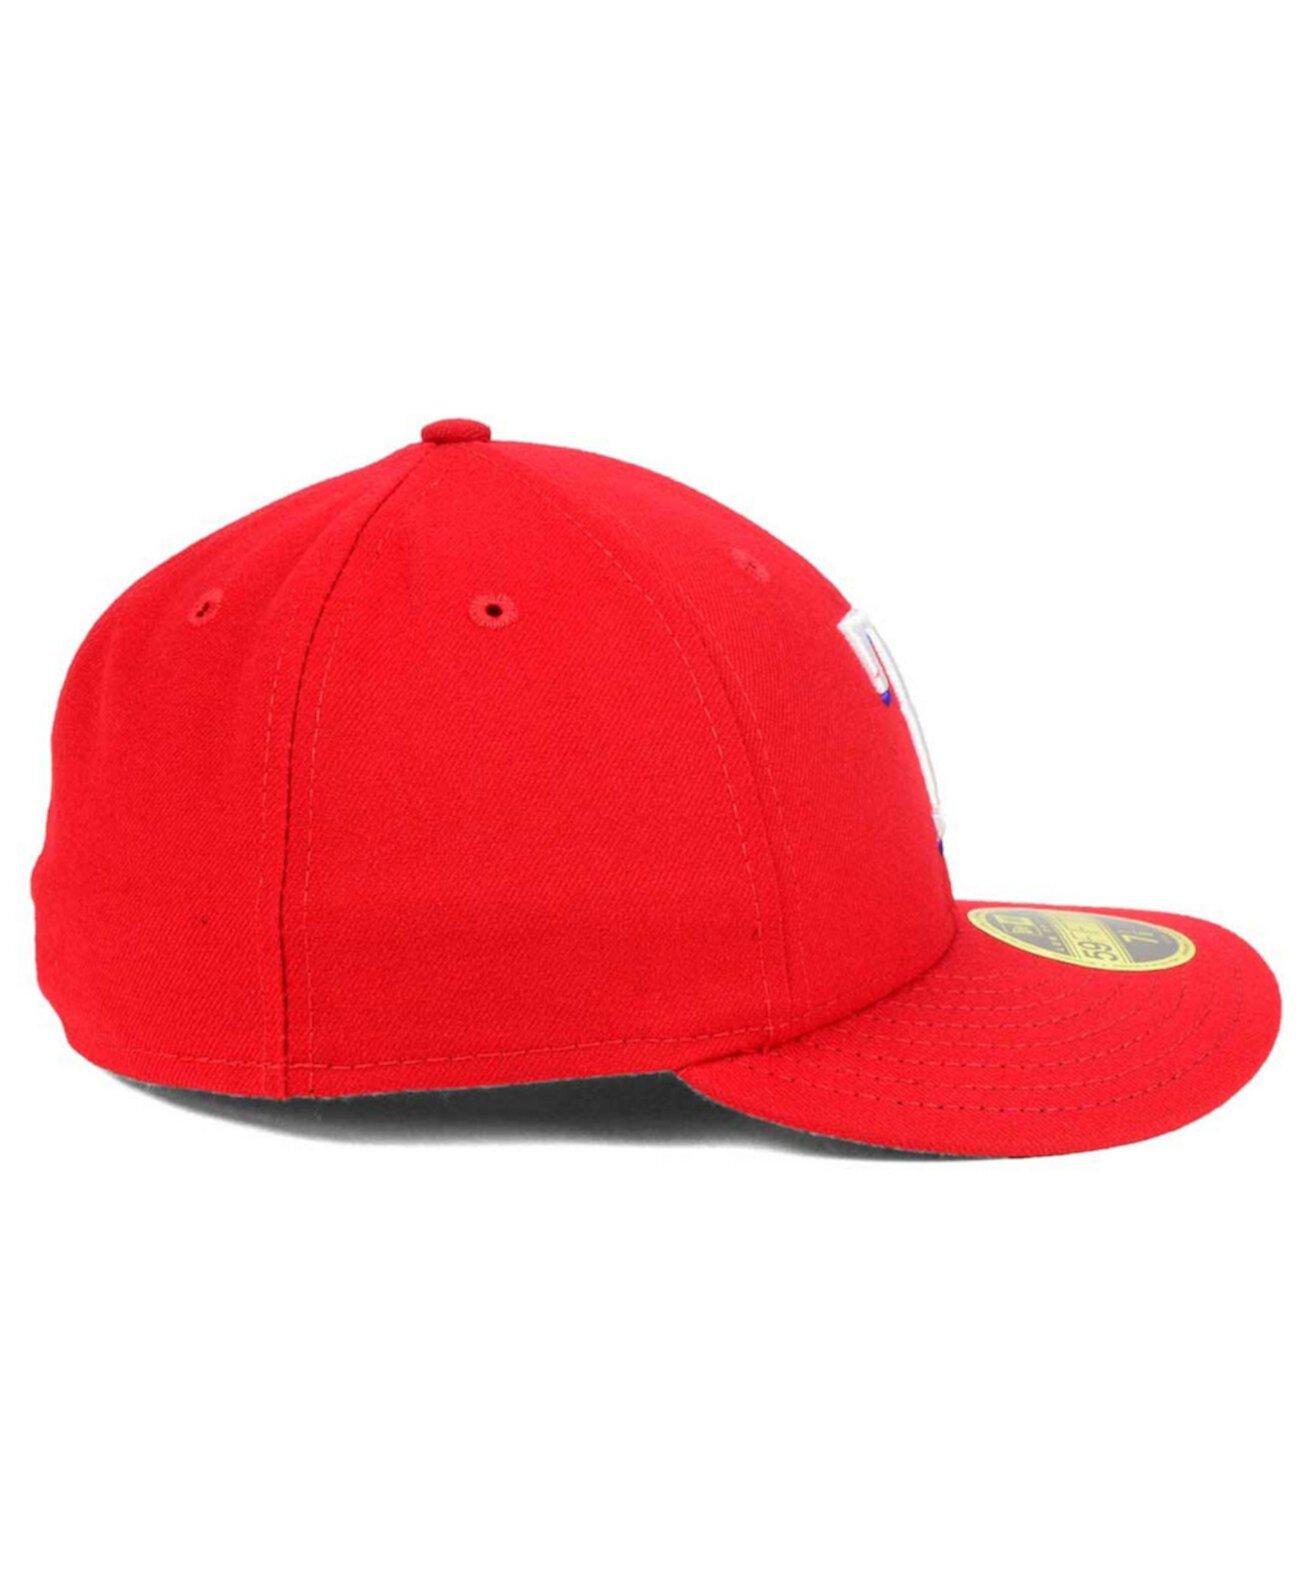 Texas Rangers Низкопрофильный AC Performance 59FIFTY Cap New Era